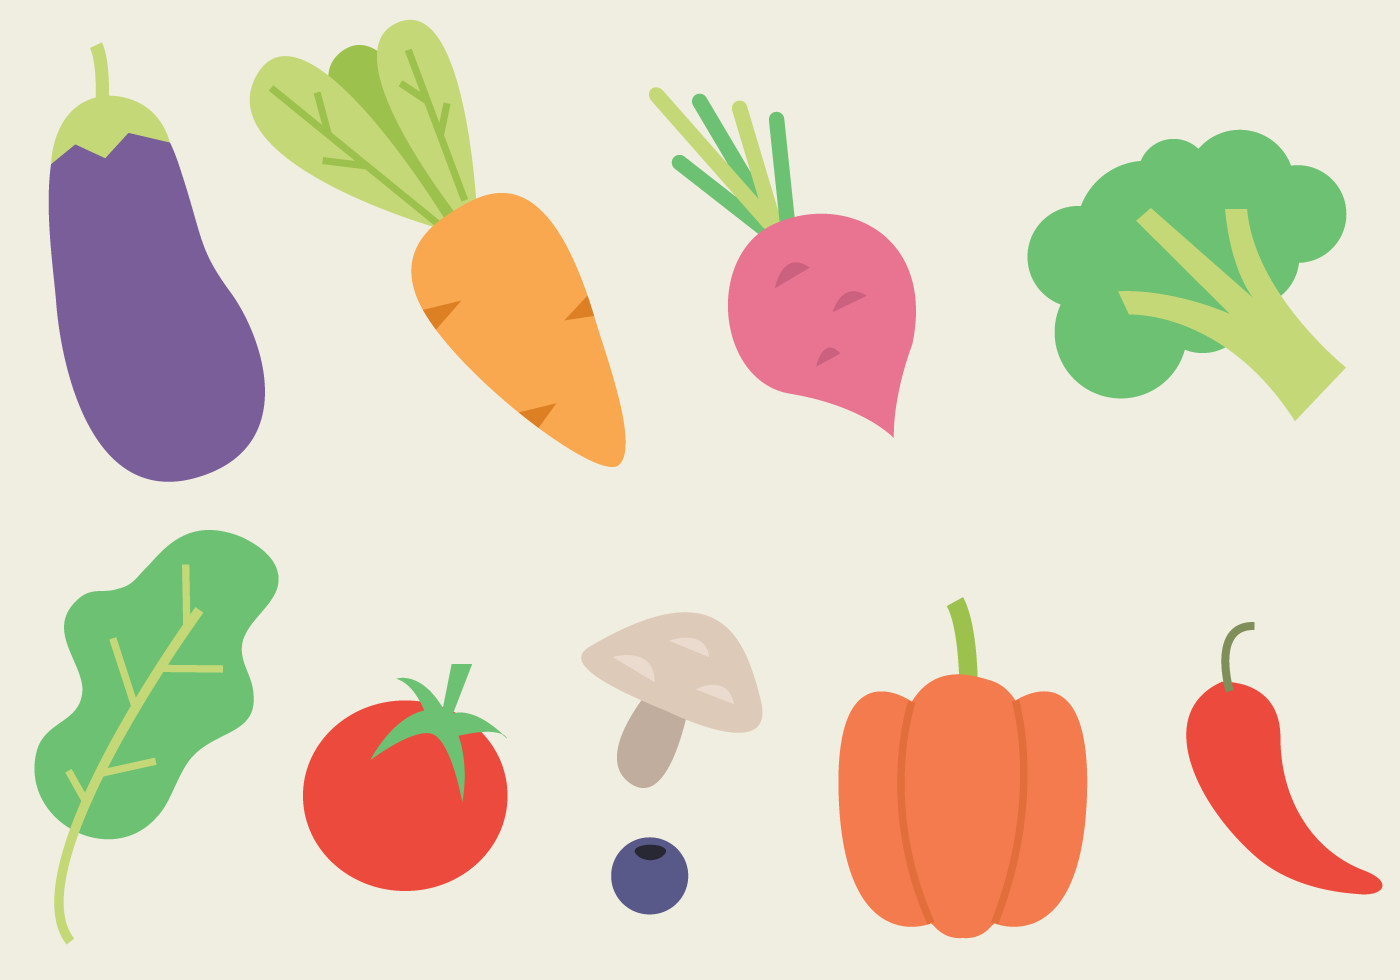 Free Vegetables Vector - Download Free Vector Art, Stock ...